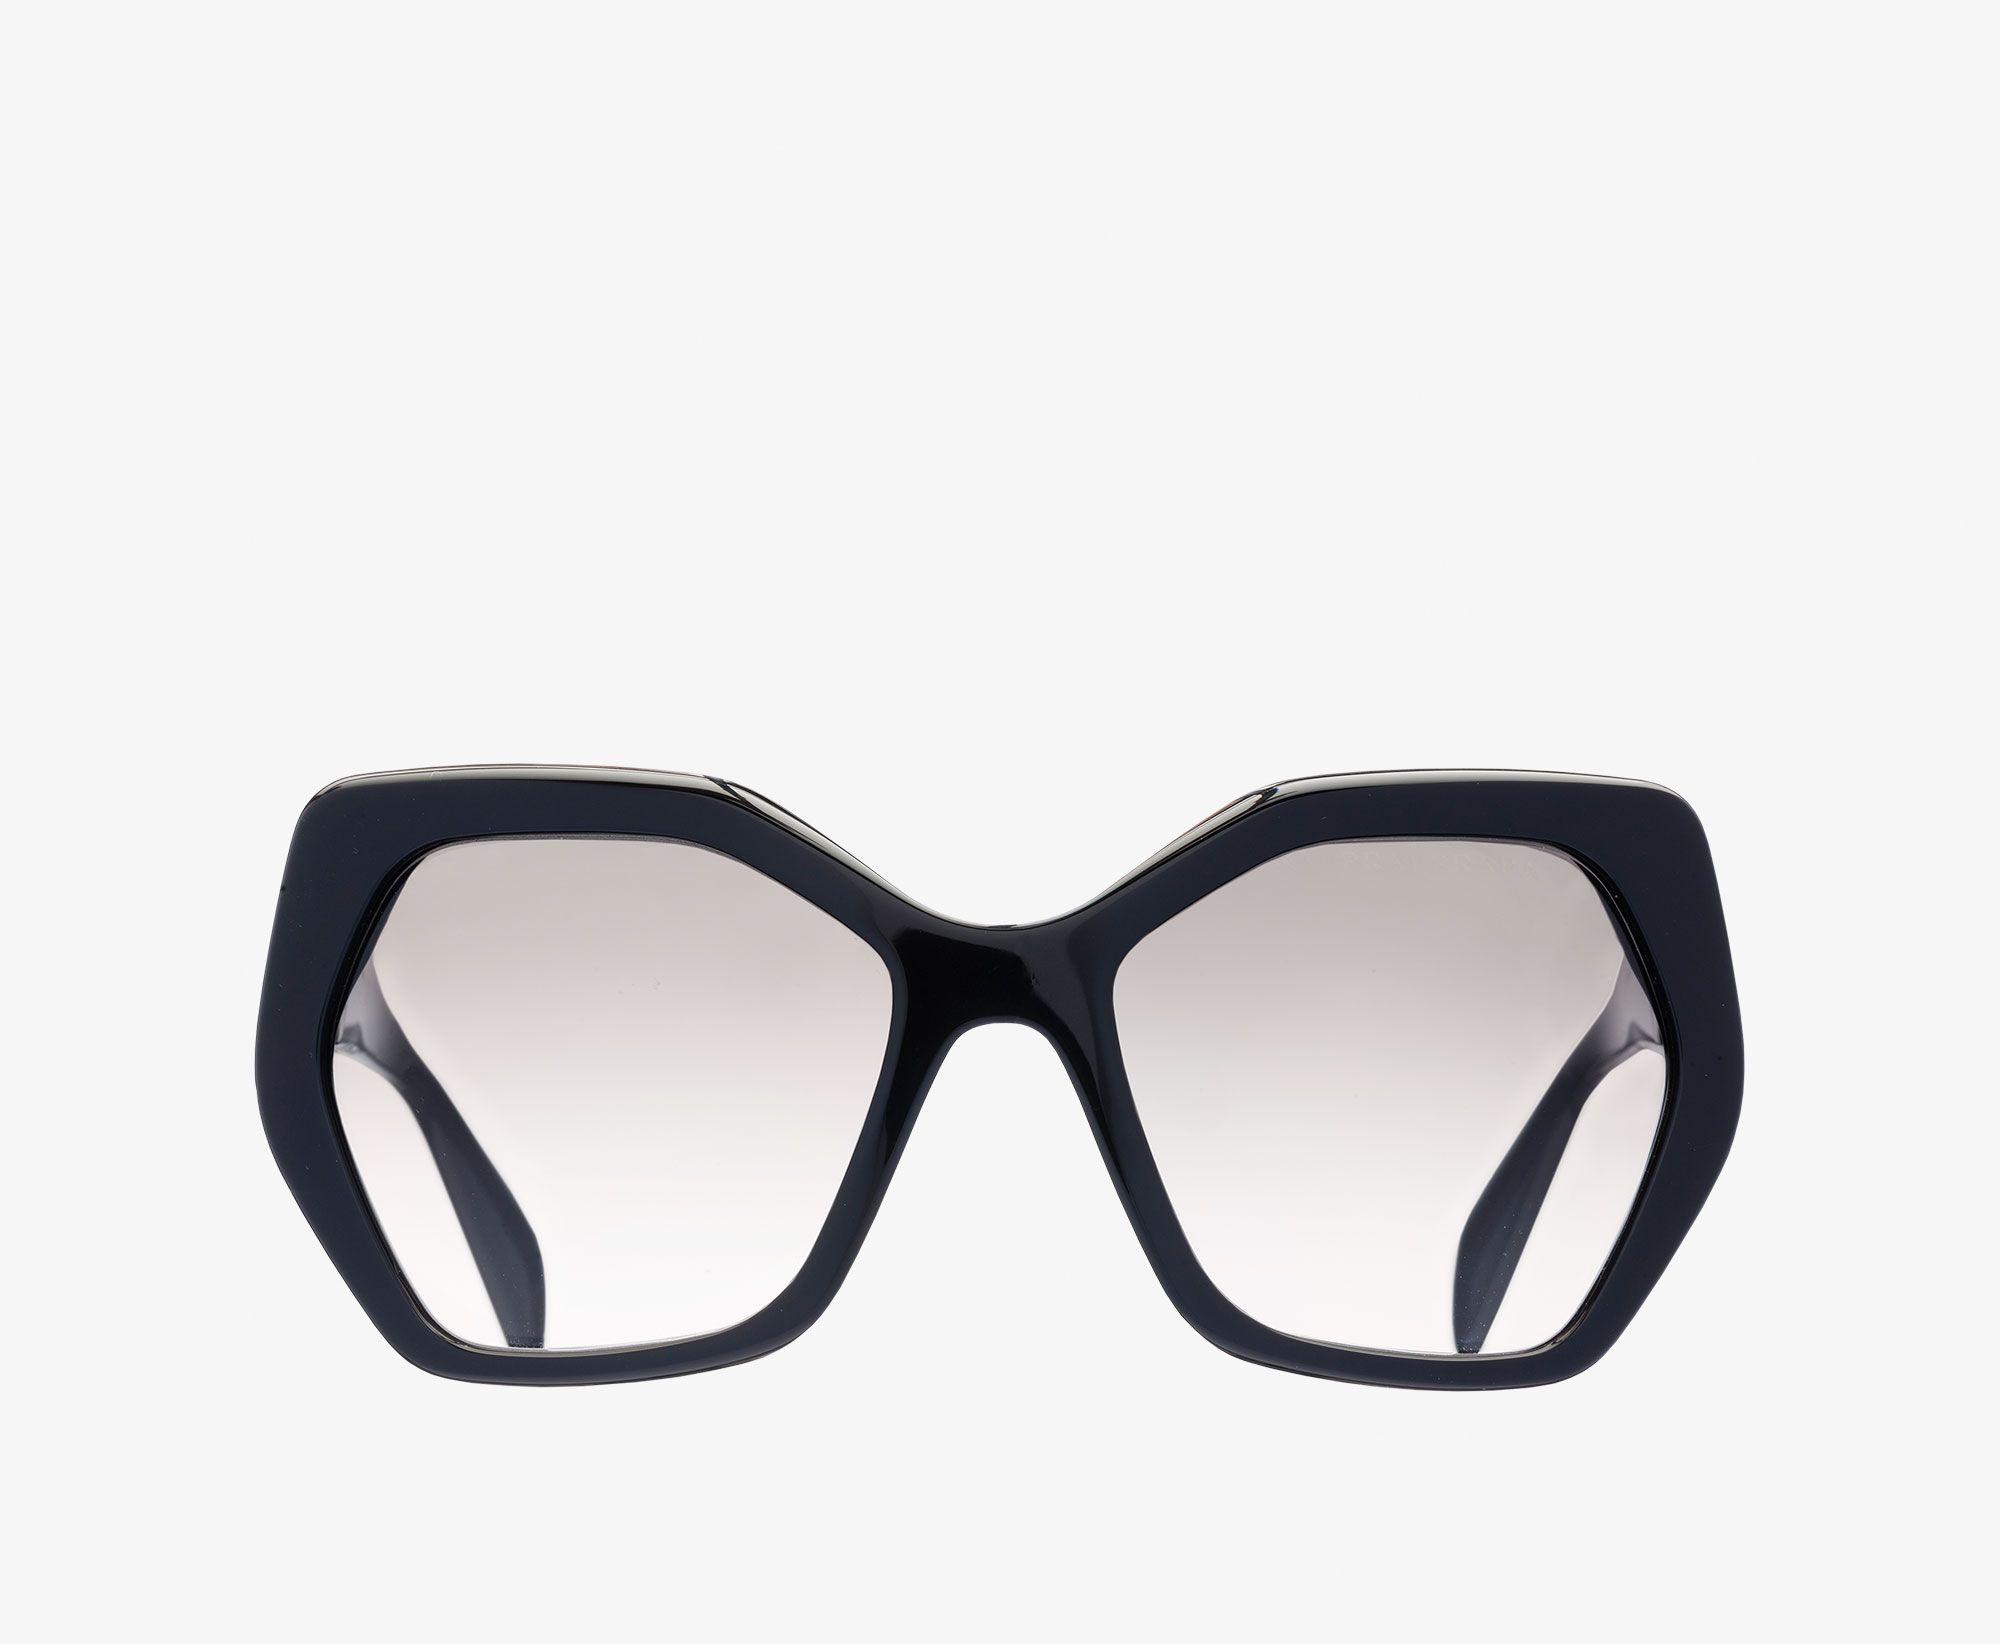 14109a727fd4 Eyewear Collection sunglasses   Wifey Closet   Eyewear, Prada, Prada ...